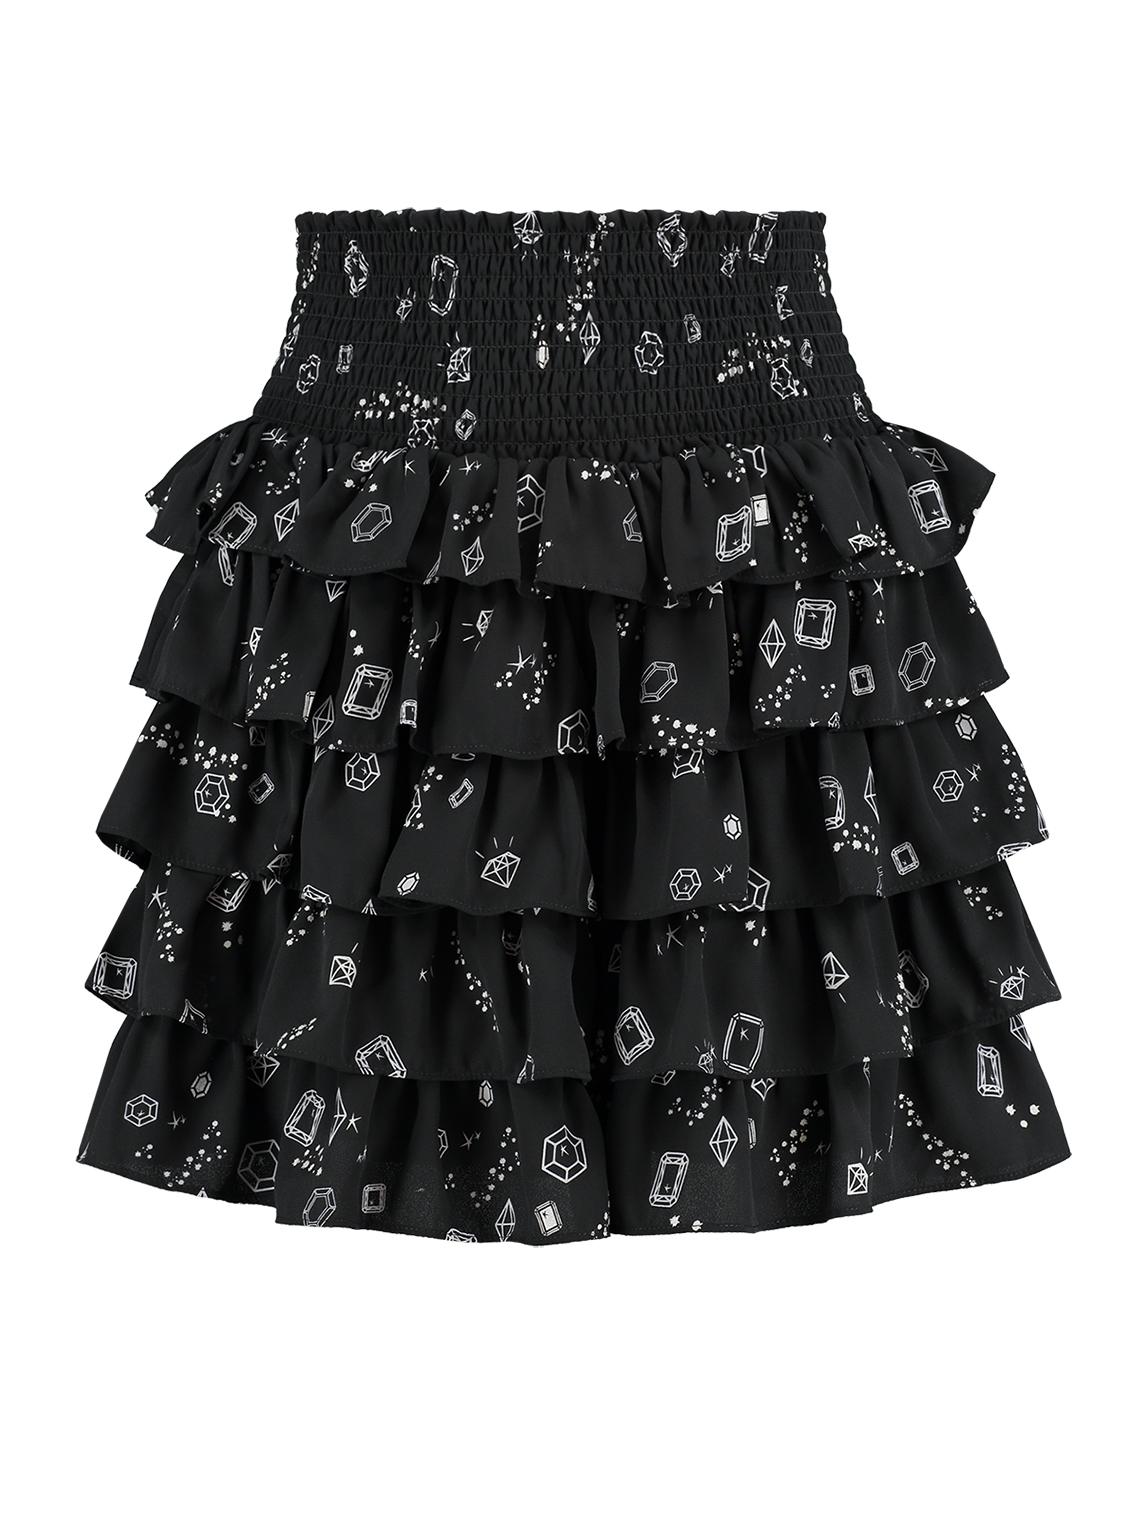 Zwarte dames rok met allover print Nikkie Lilo Skirt - N3-761 1901 9000